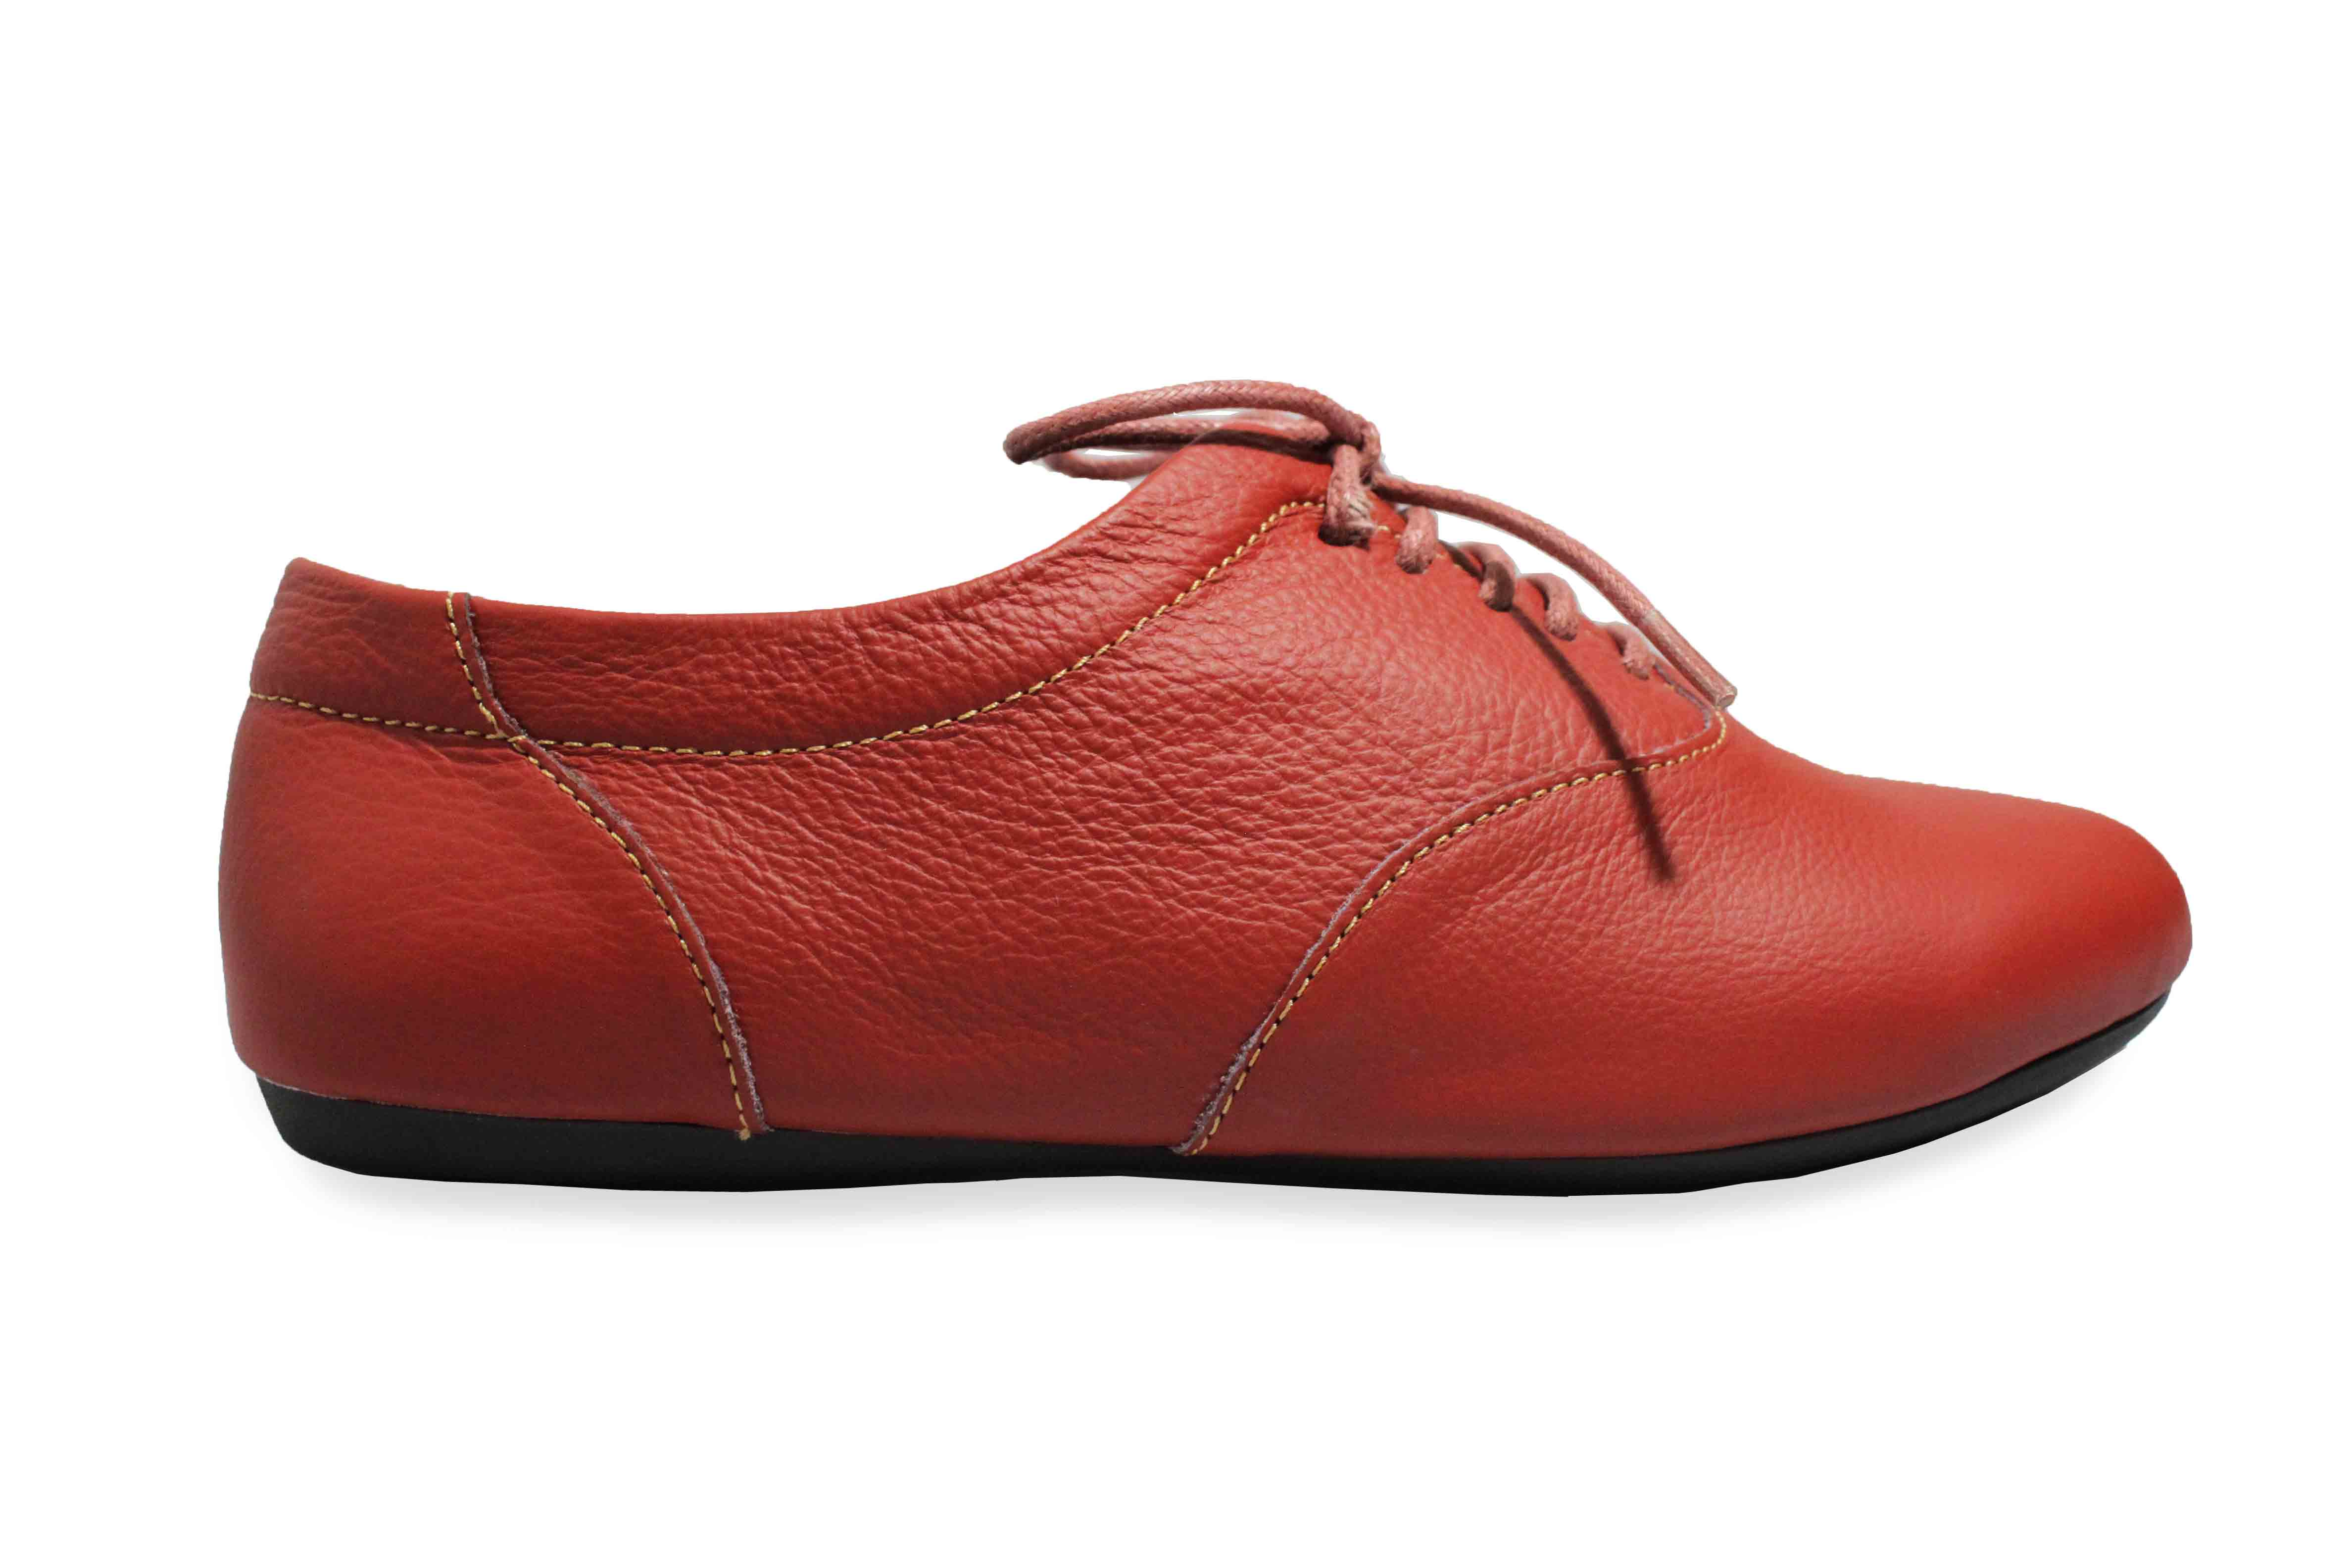 giày oxford mũi tròn